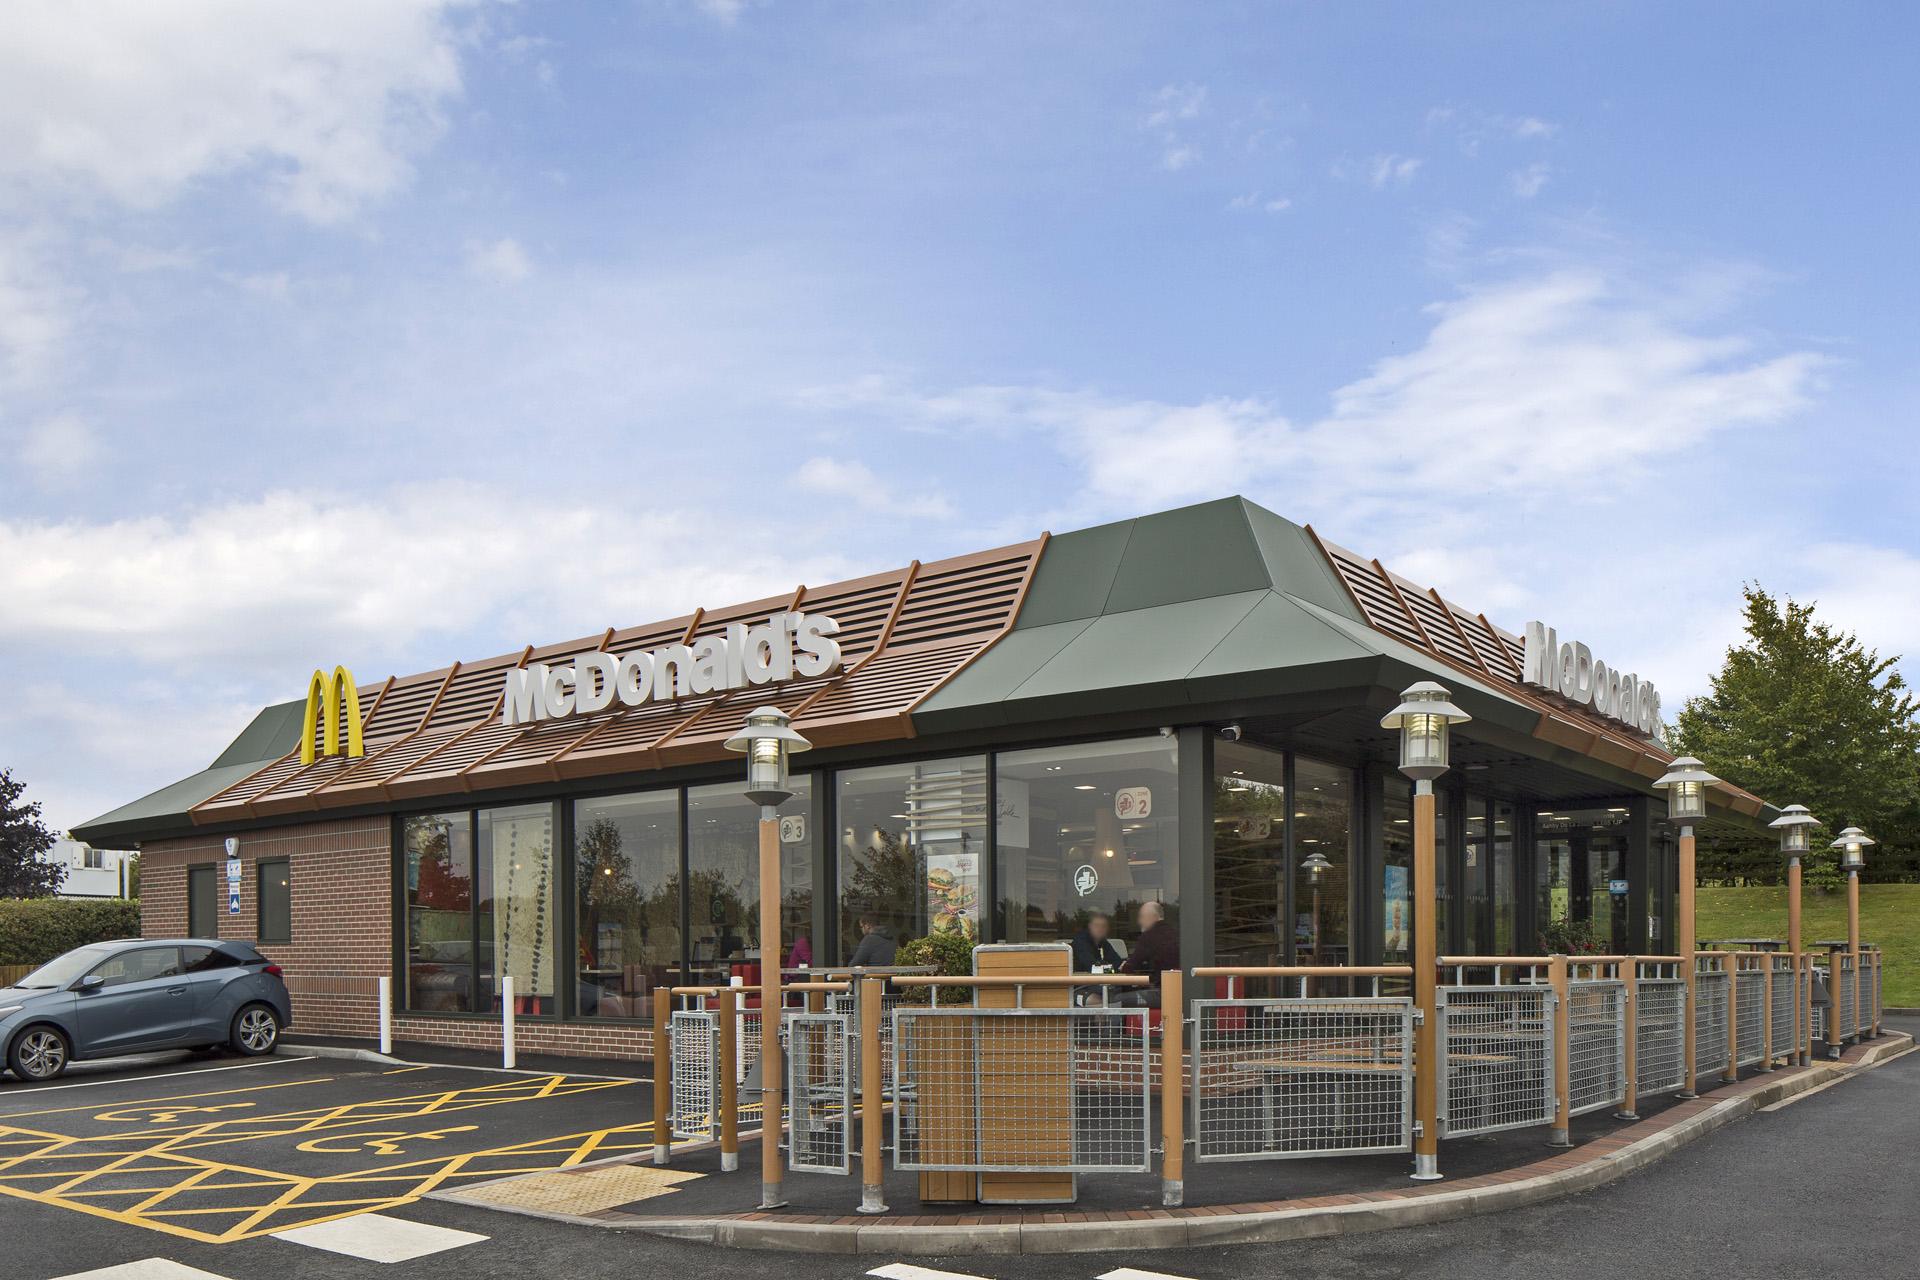 McDonalds Groundworks